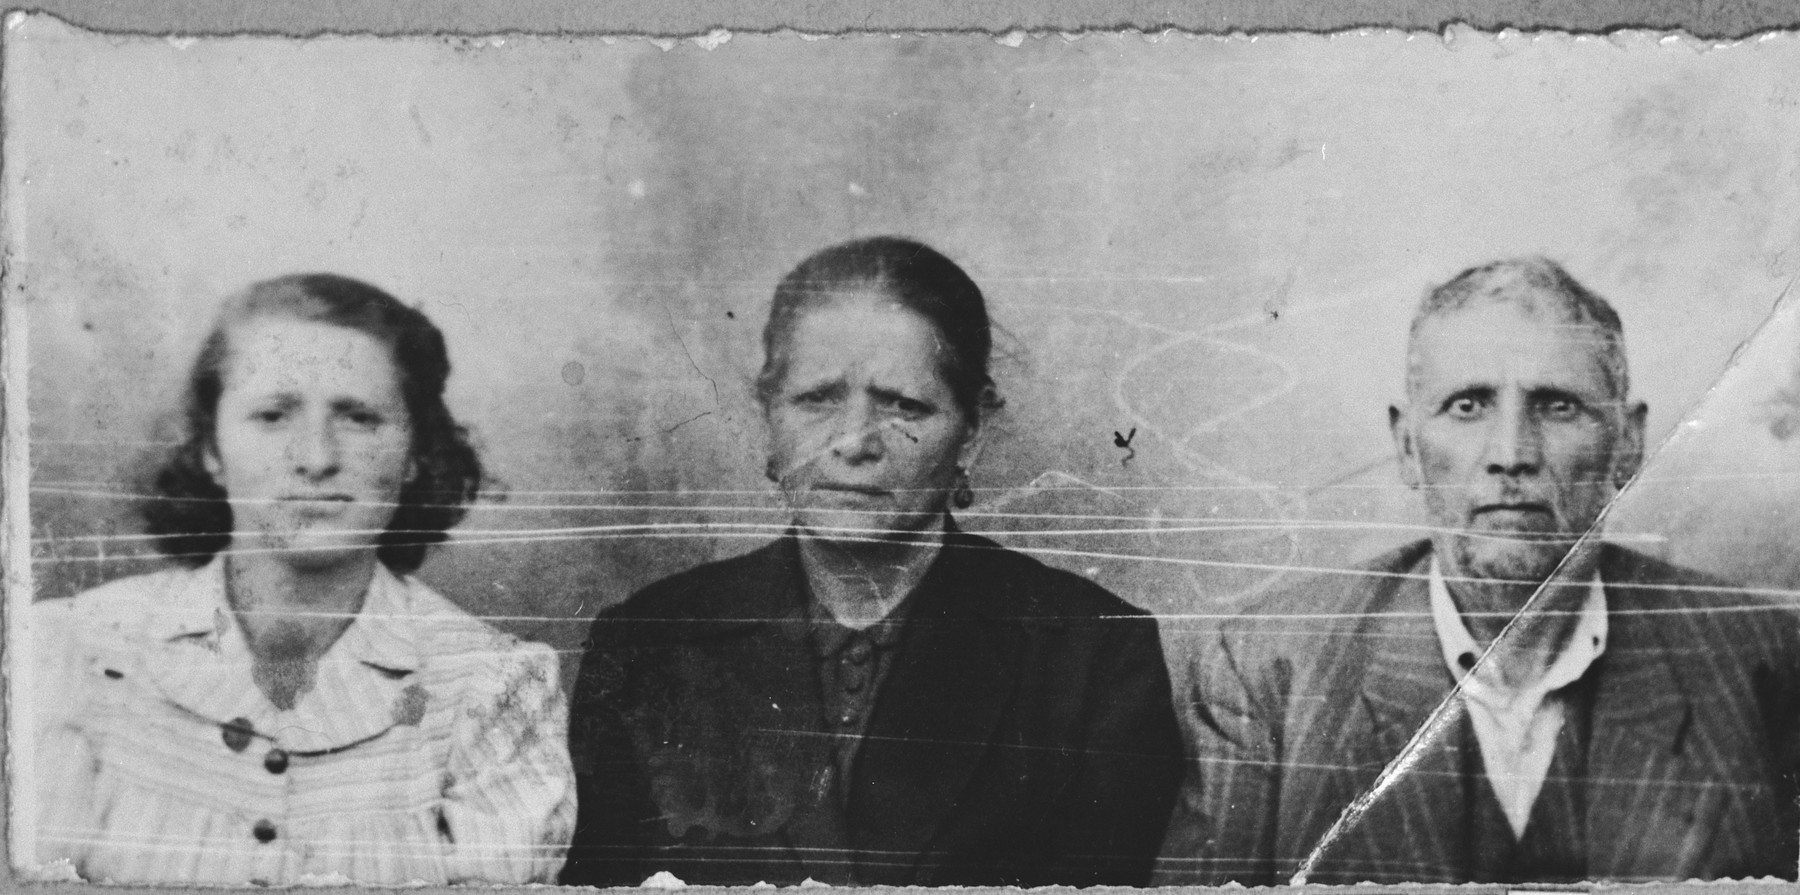 Portrait of Mordechai Levi, his wife, Hana, and his daugheter, Arnesta.  Mordechai was a second-hand dealer.  Arnesta was a student.  They lived at Asadbegova 6 in Bitola.